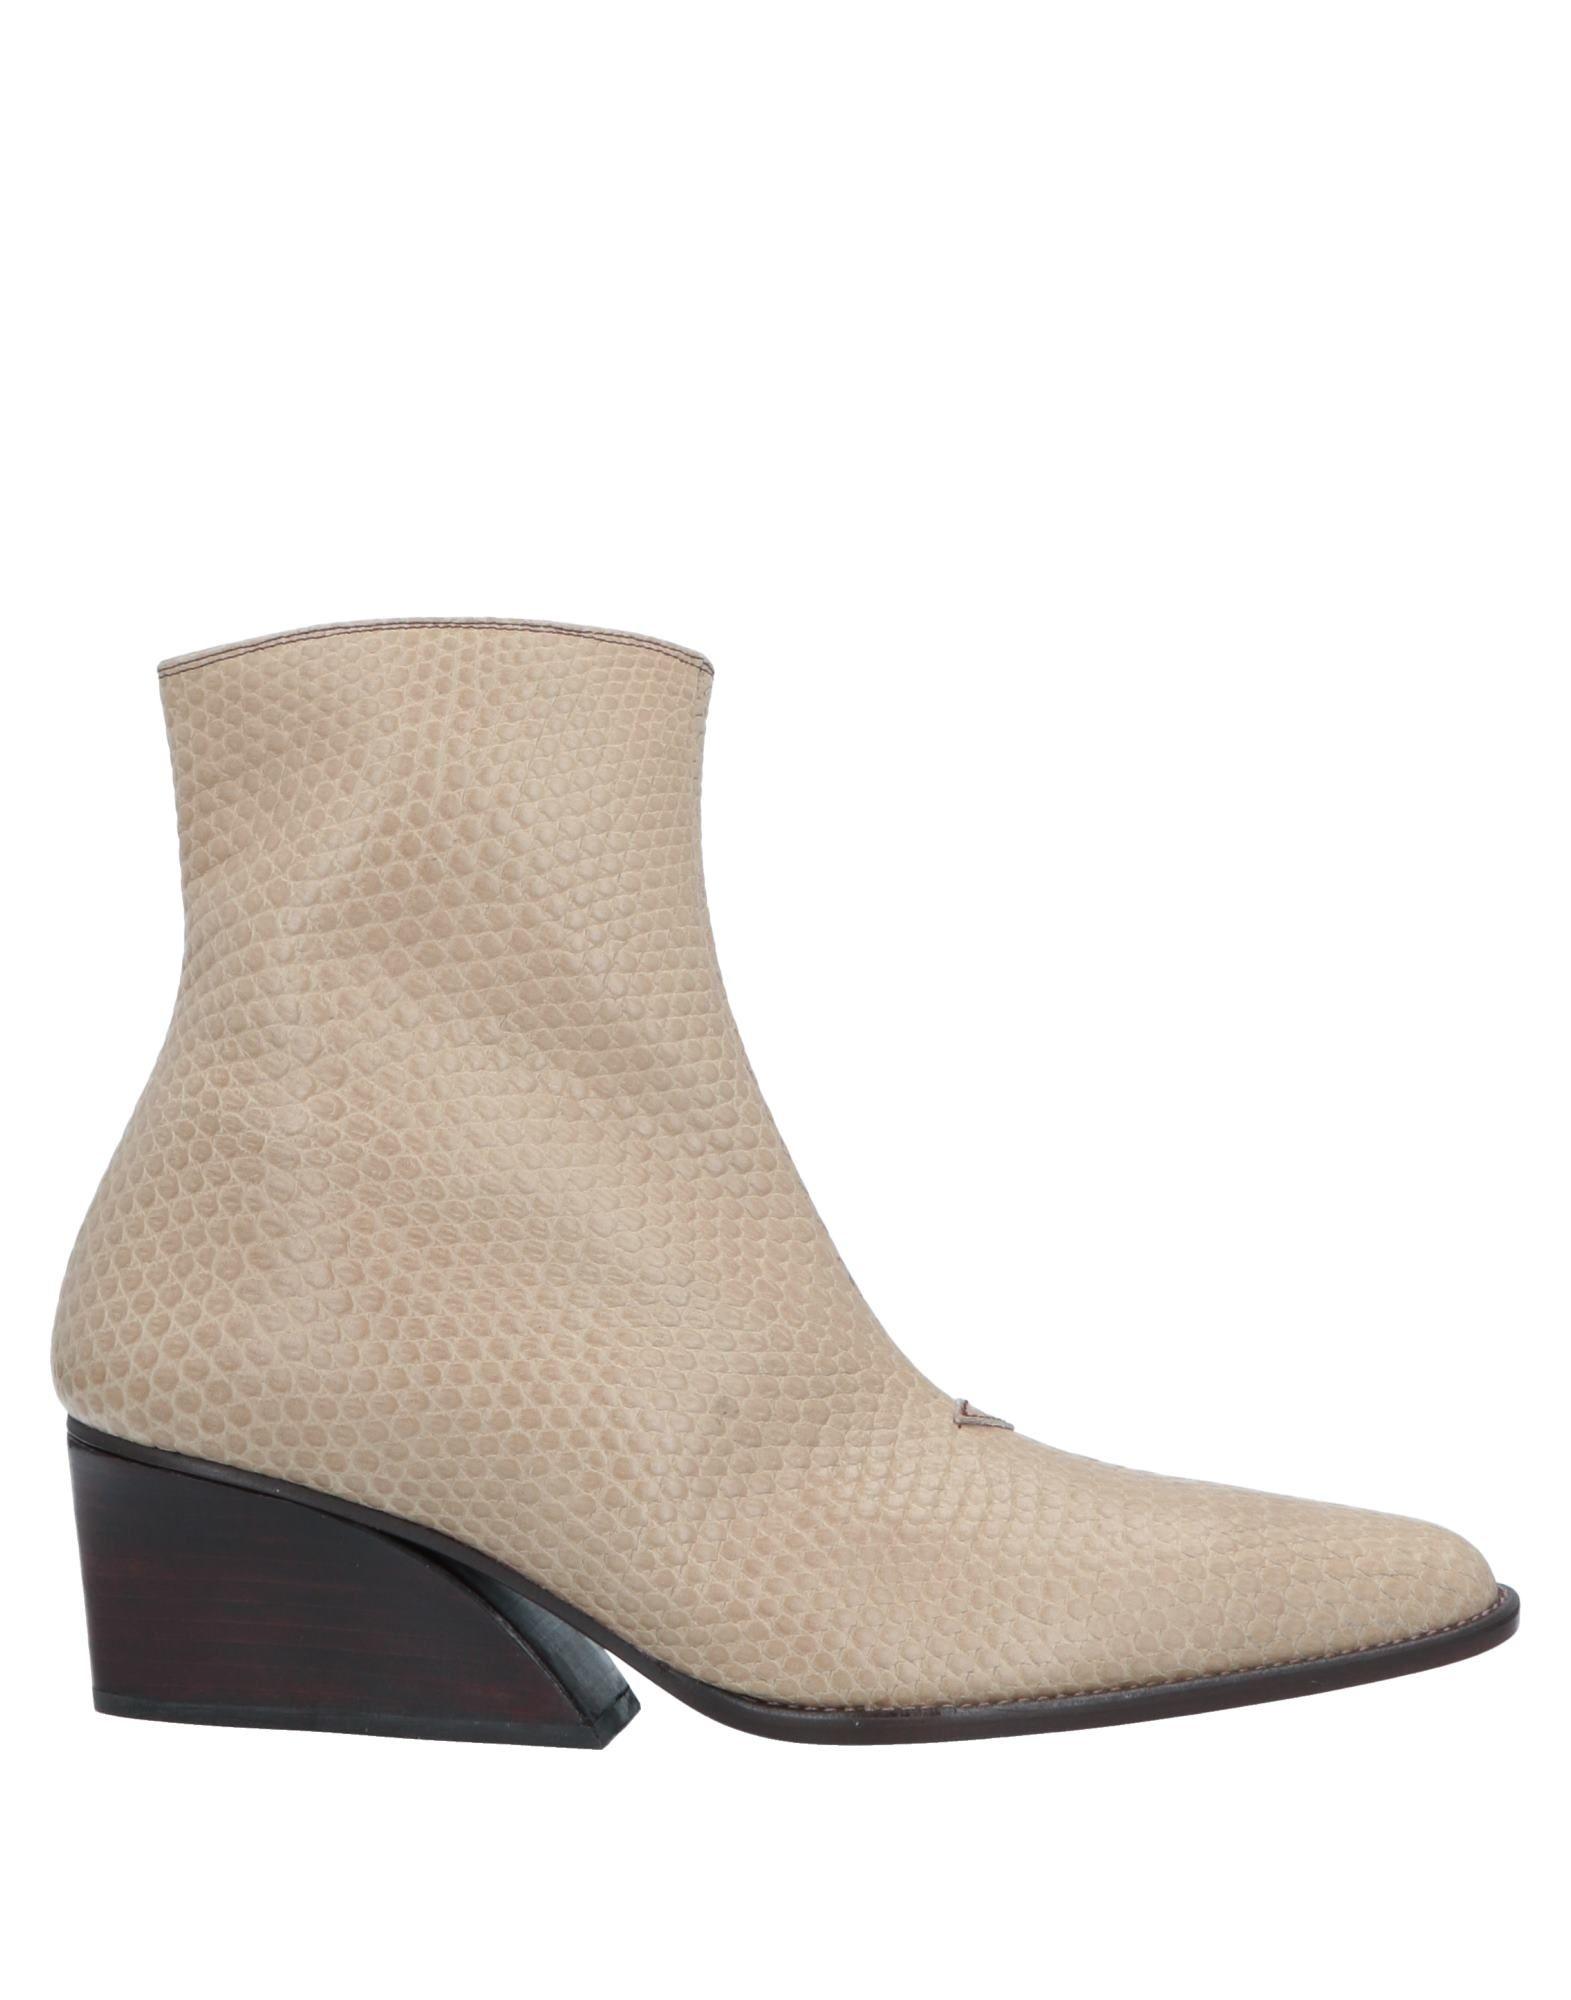 STEPHANE KÉLIAN Полусапоги и высокие ботинки stephane kélian полусапоги и высокие ботинки